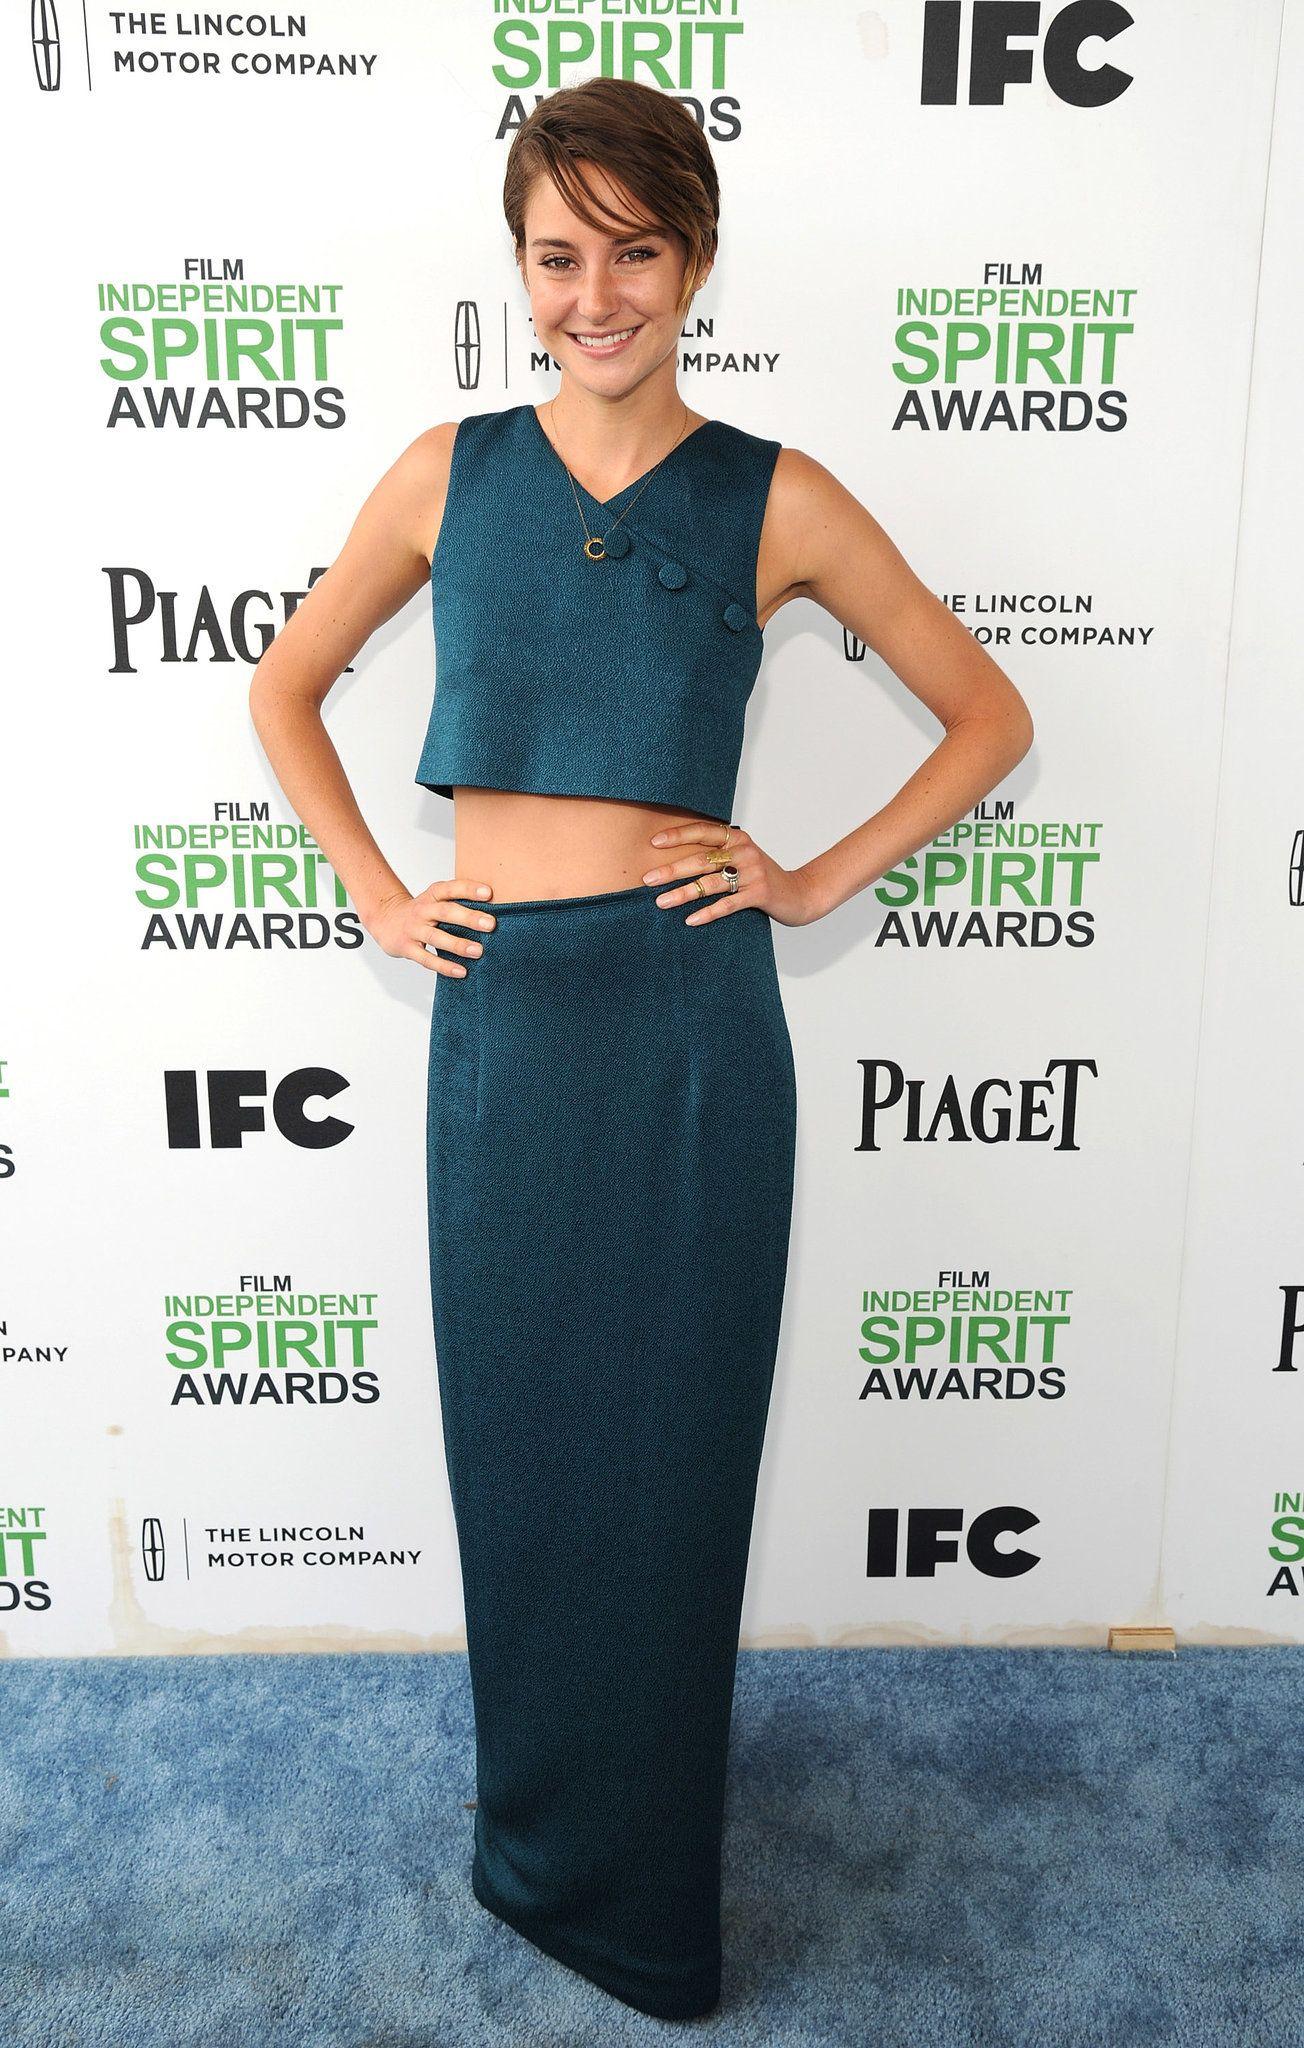 Shailene Woodley bared her midriff in oceanic blue separates.